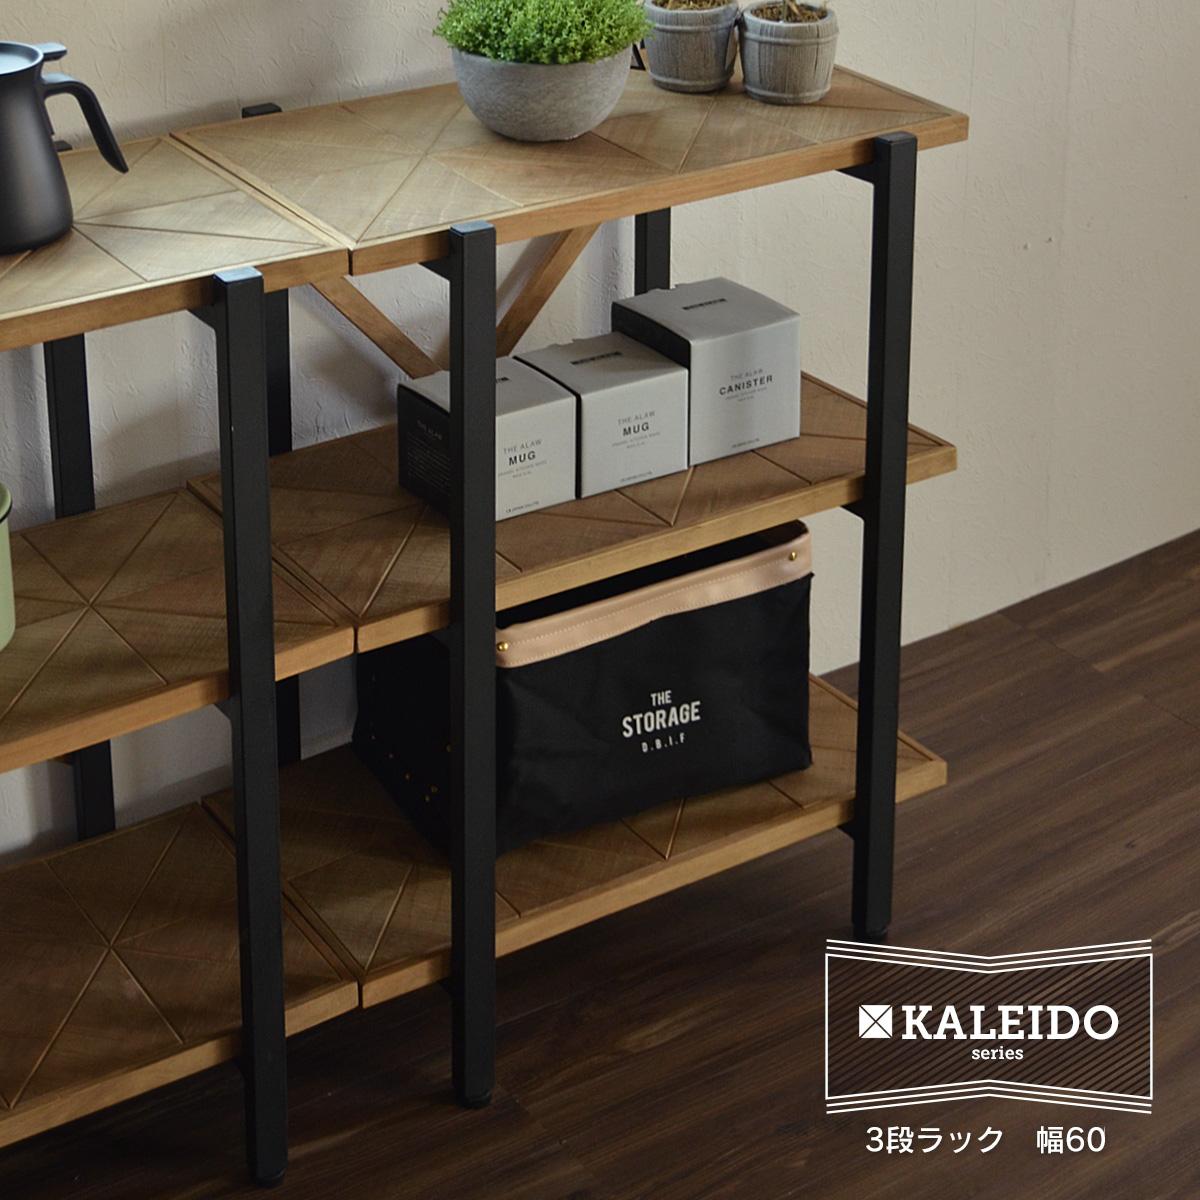 KALEIDO カレイド 3段ラック 幅60 オープン 収納 木製 棚 本棚 シェルフ 間仕切り ディスプレイ コンパクト スリム 省スペース 一人暮らし リビング おしゃれ デザインビンテージ